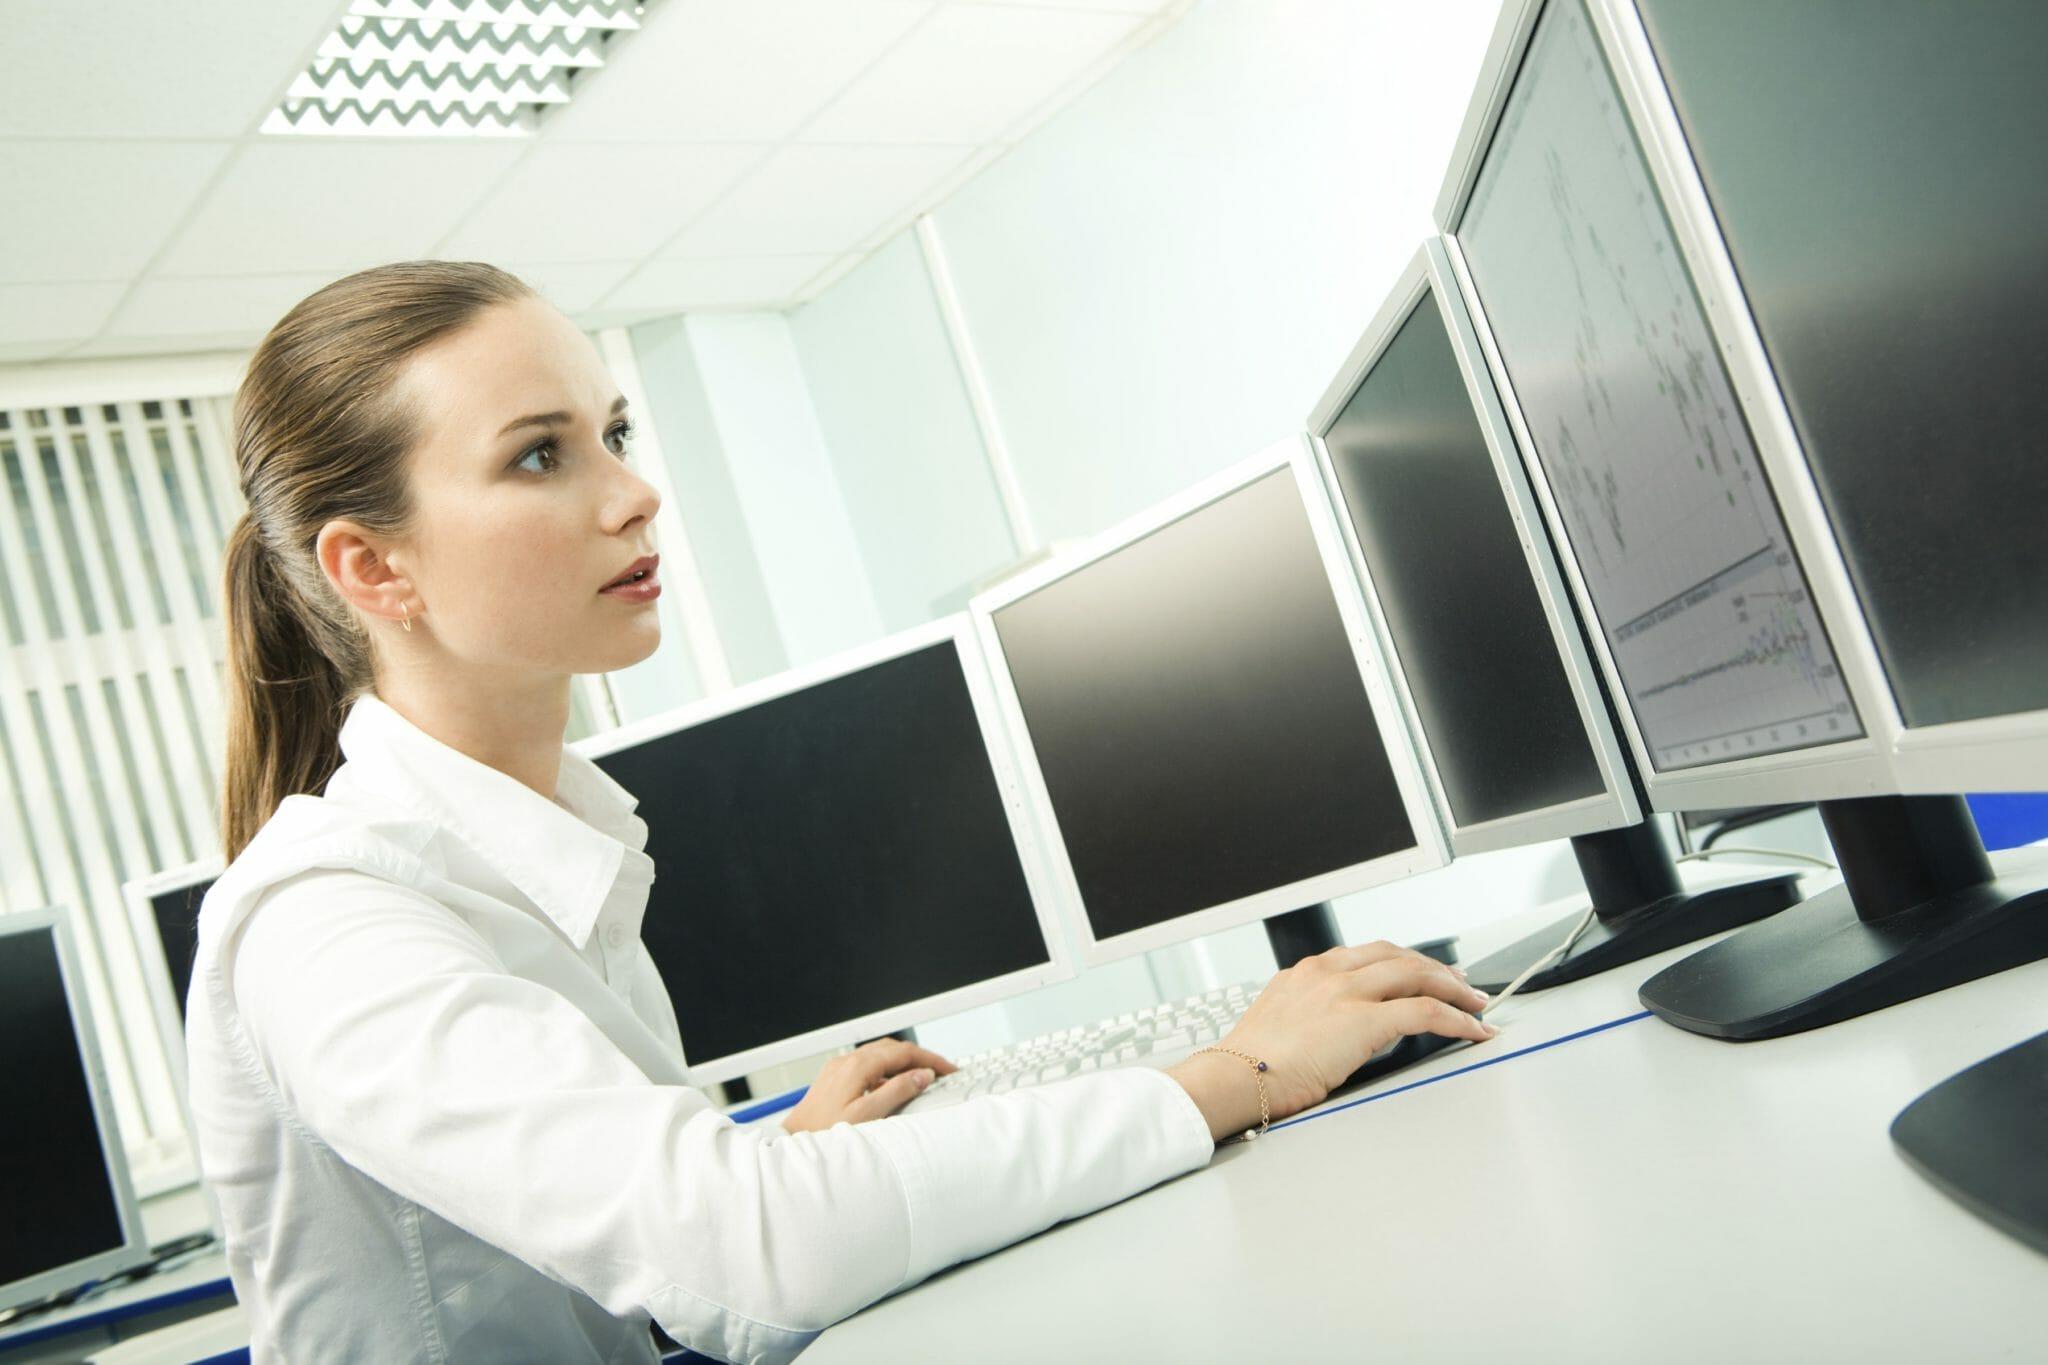 project management tools - PMWorld 360